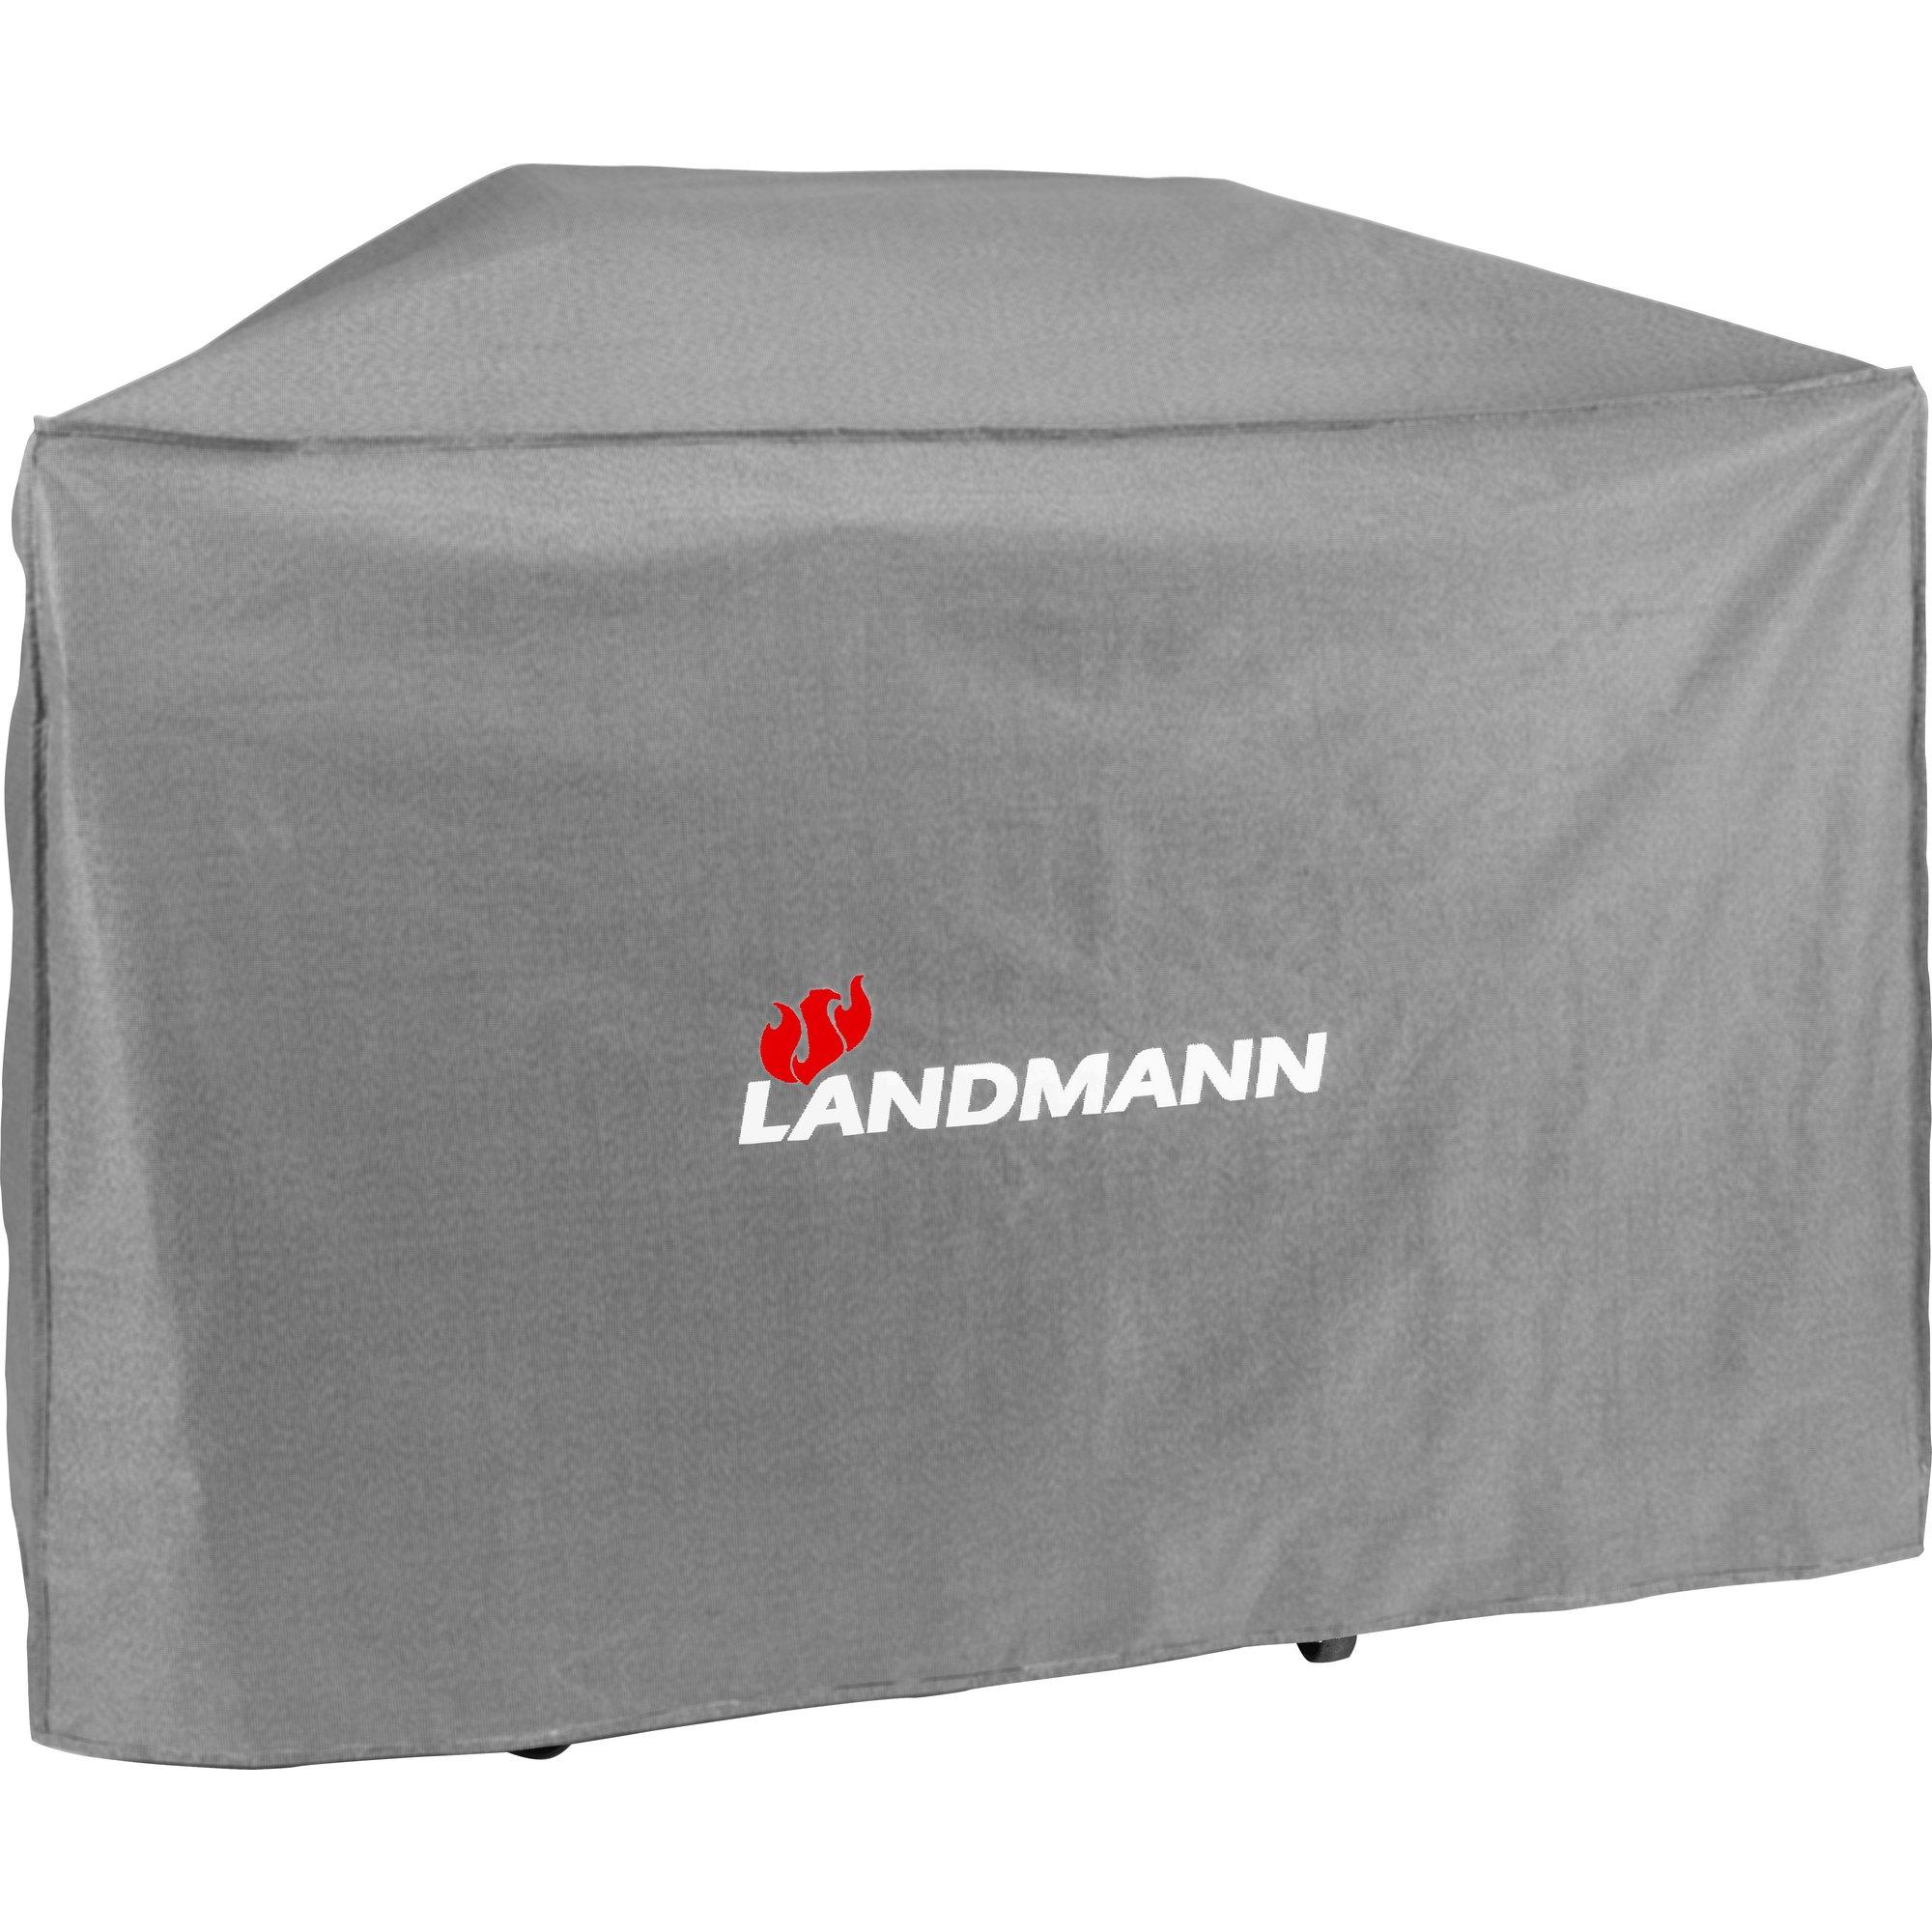 Landmann Premium XL överdrag 180x55x104 cm.